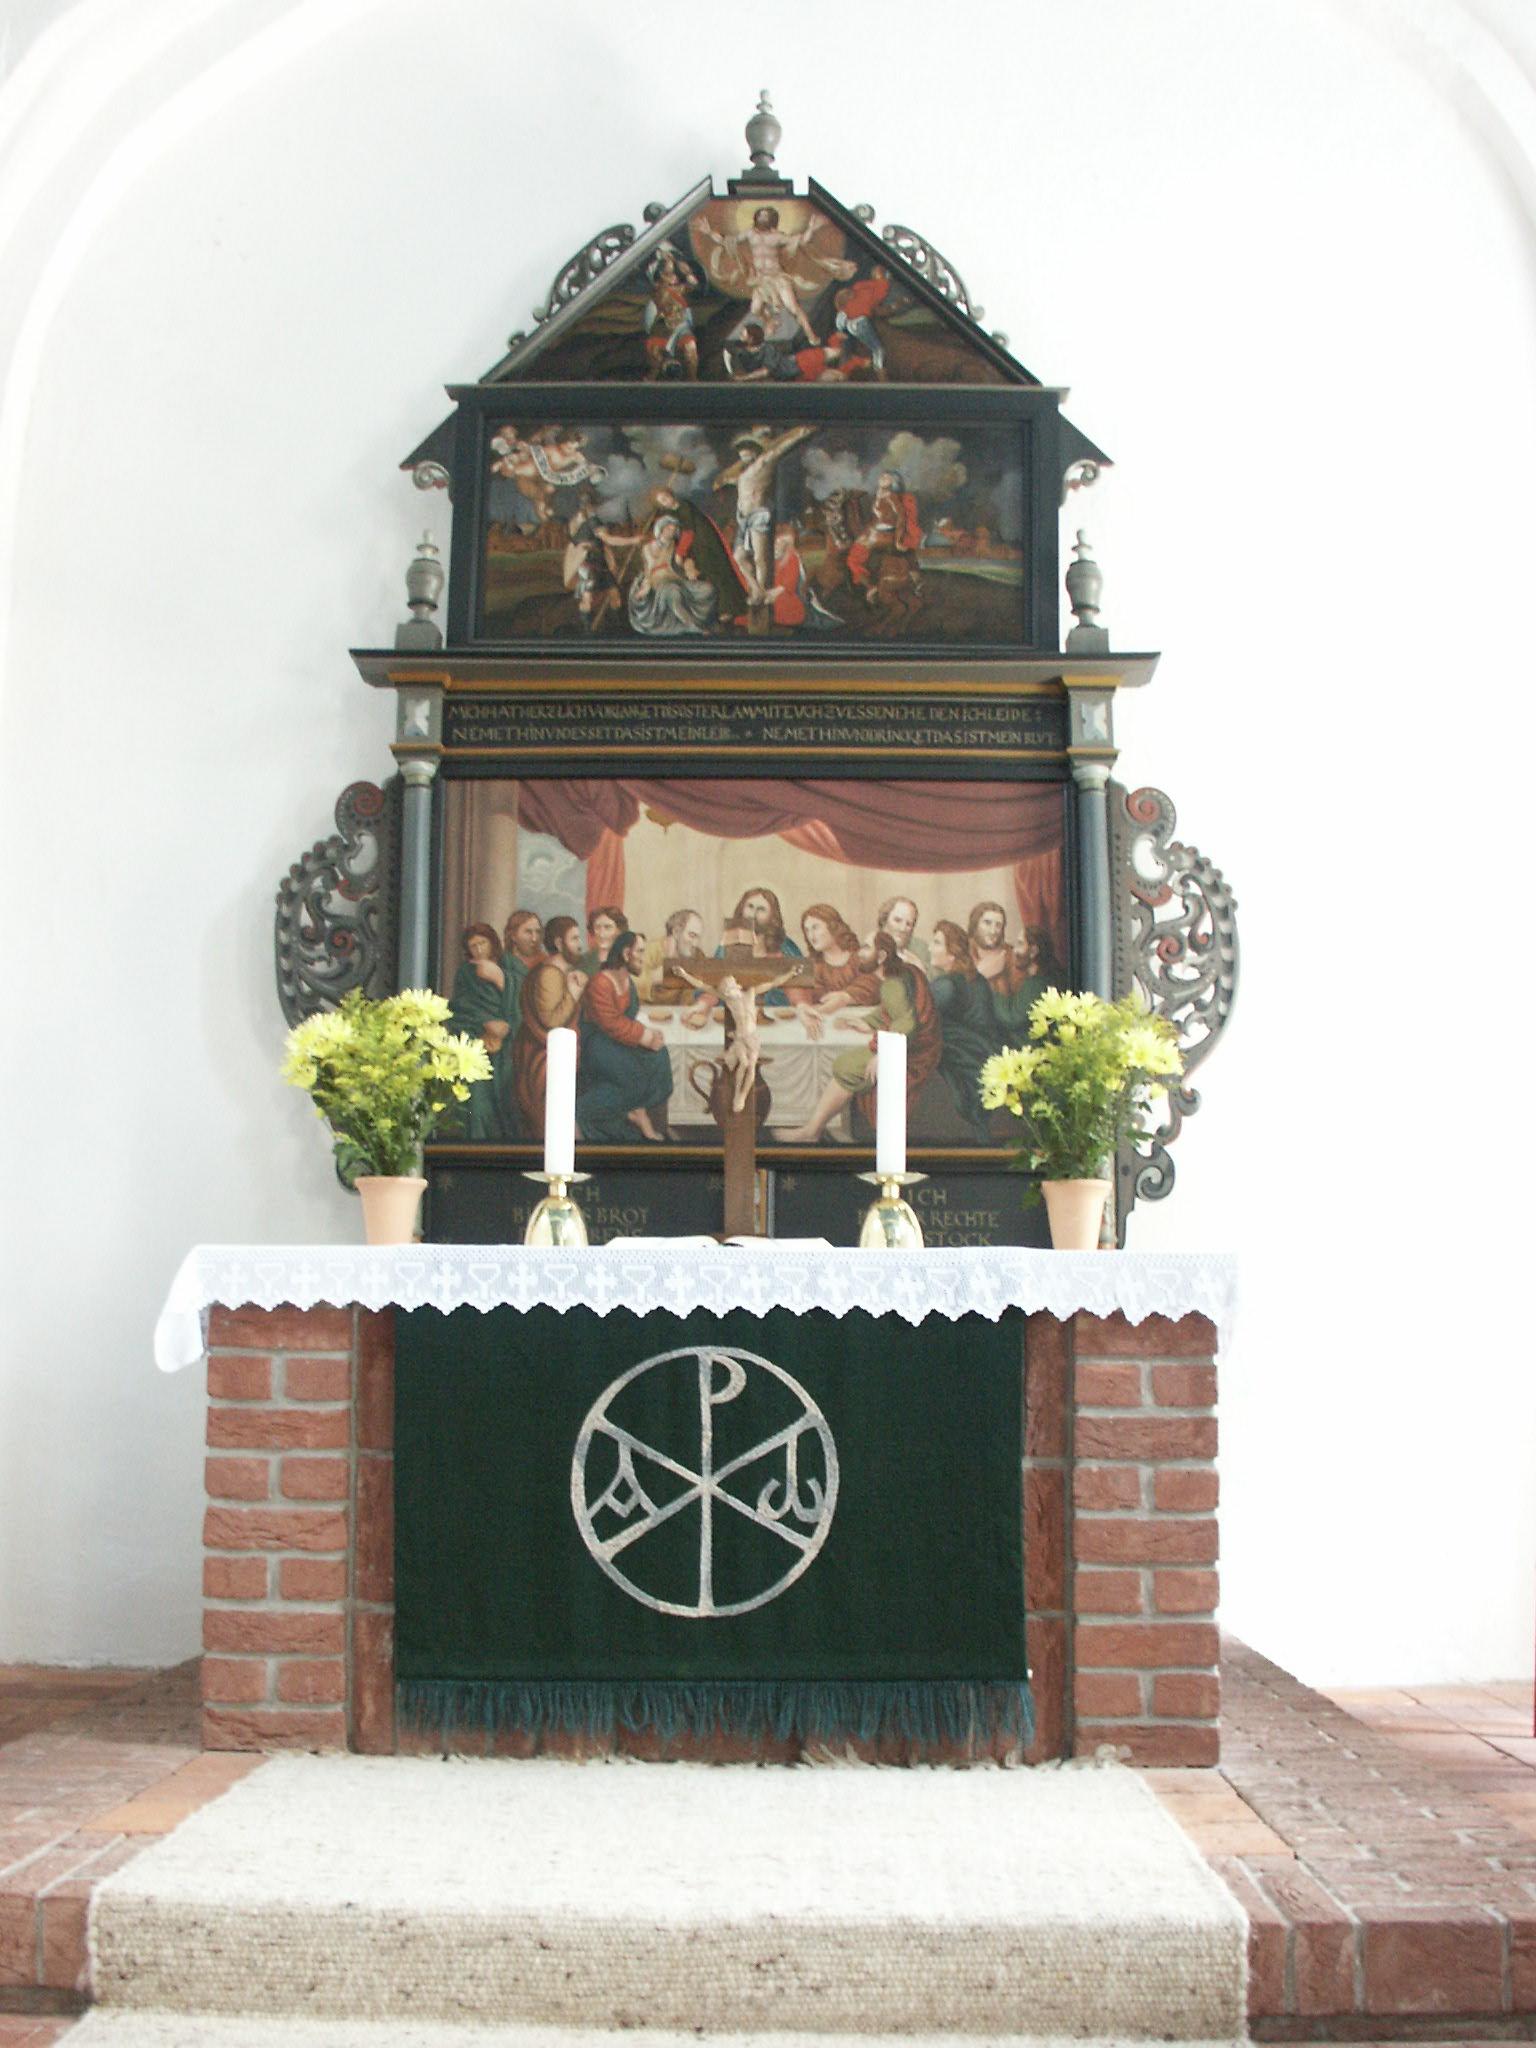 Westerholt Herford